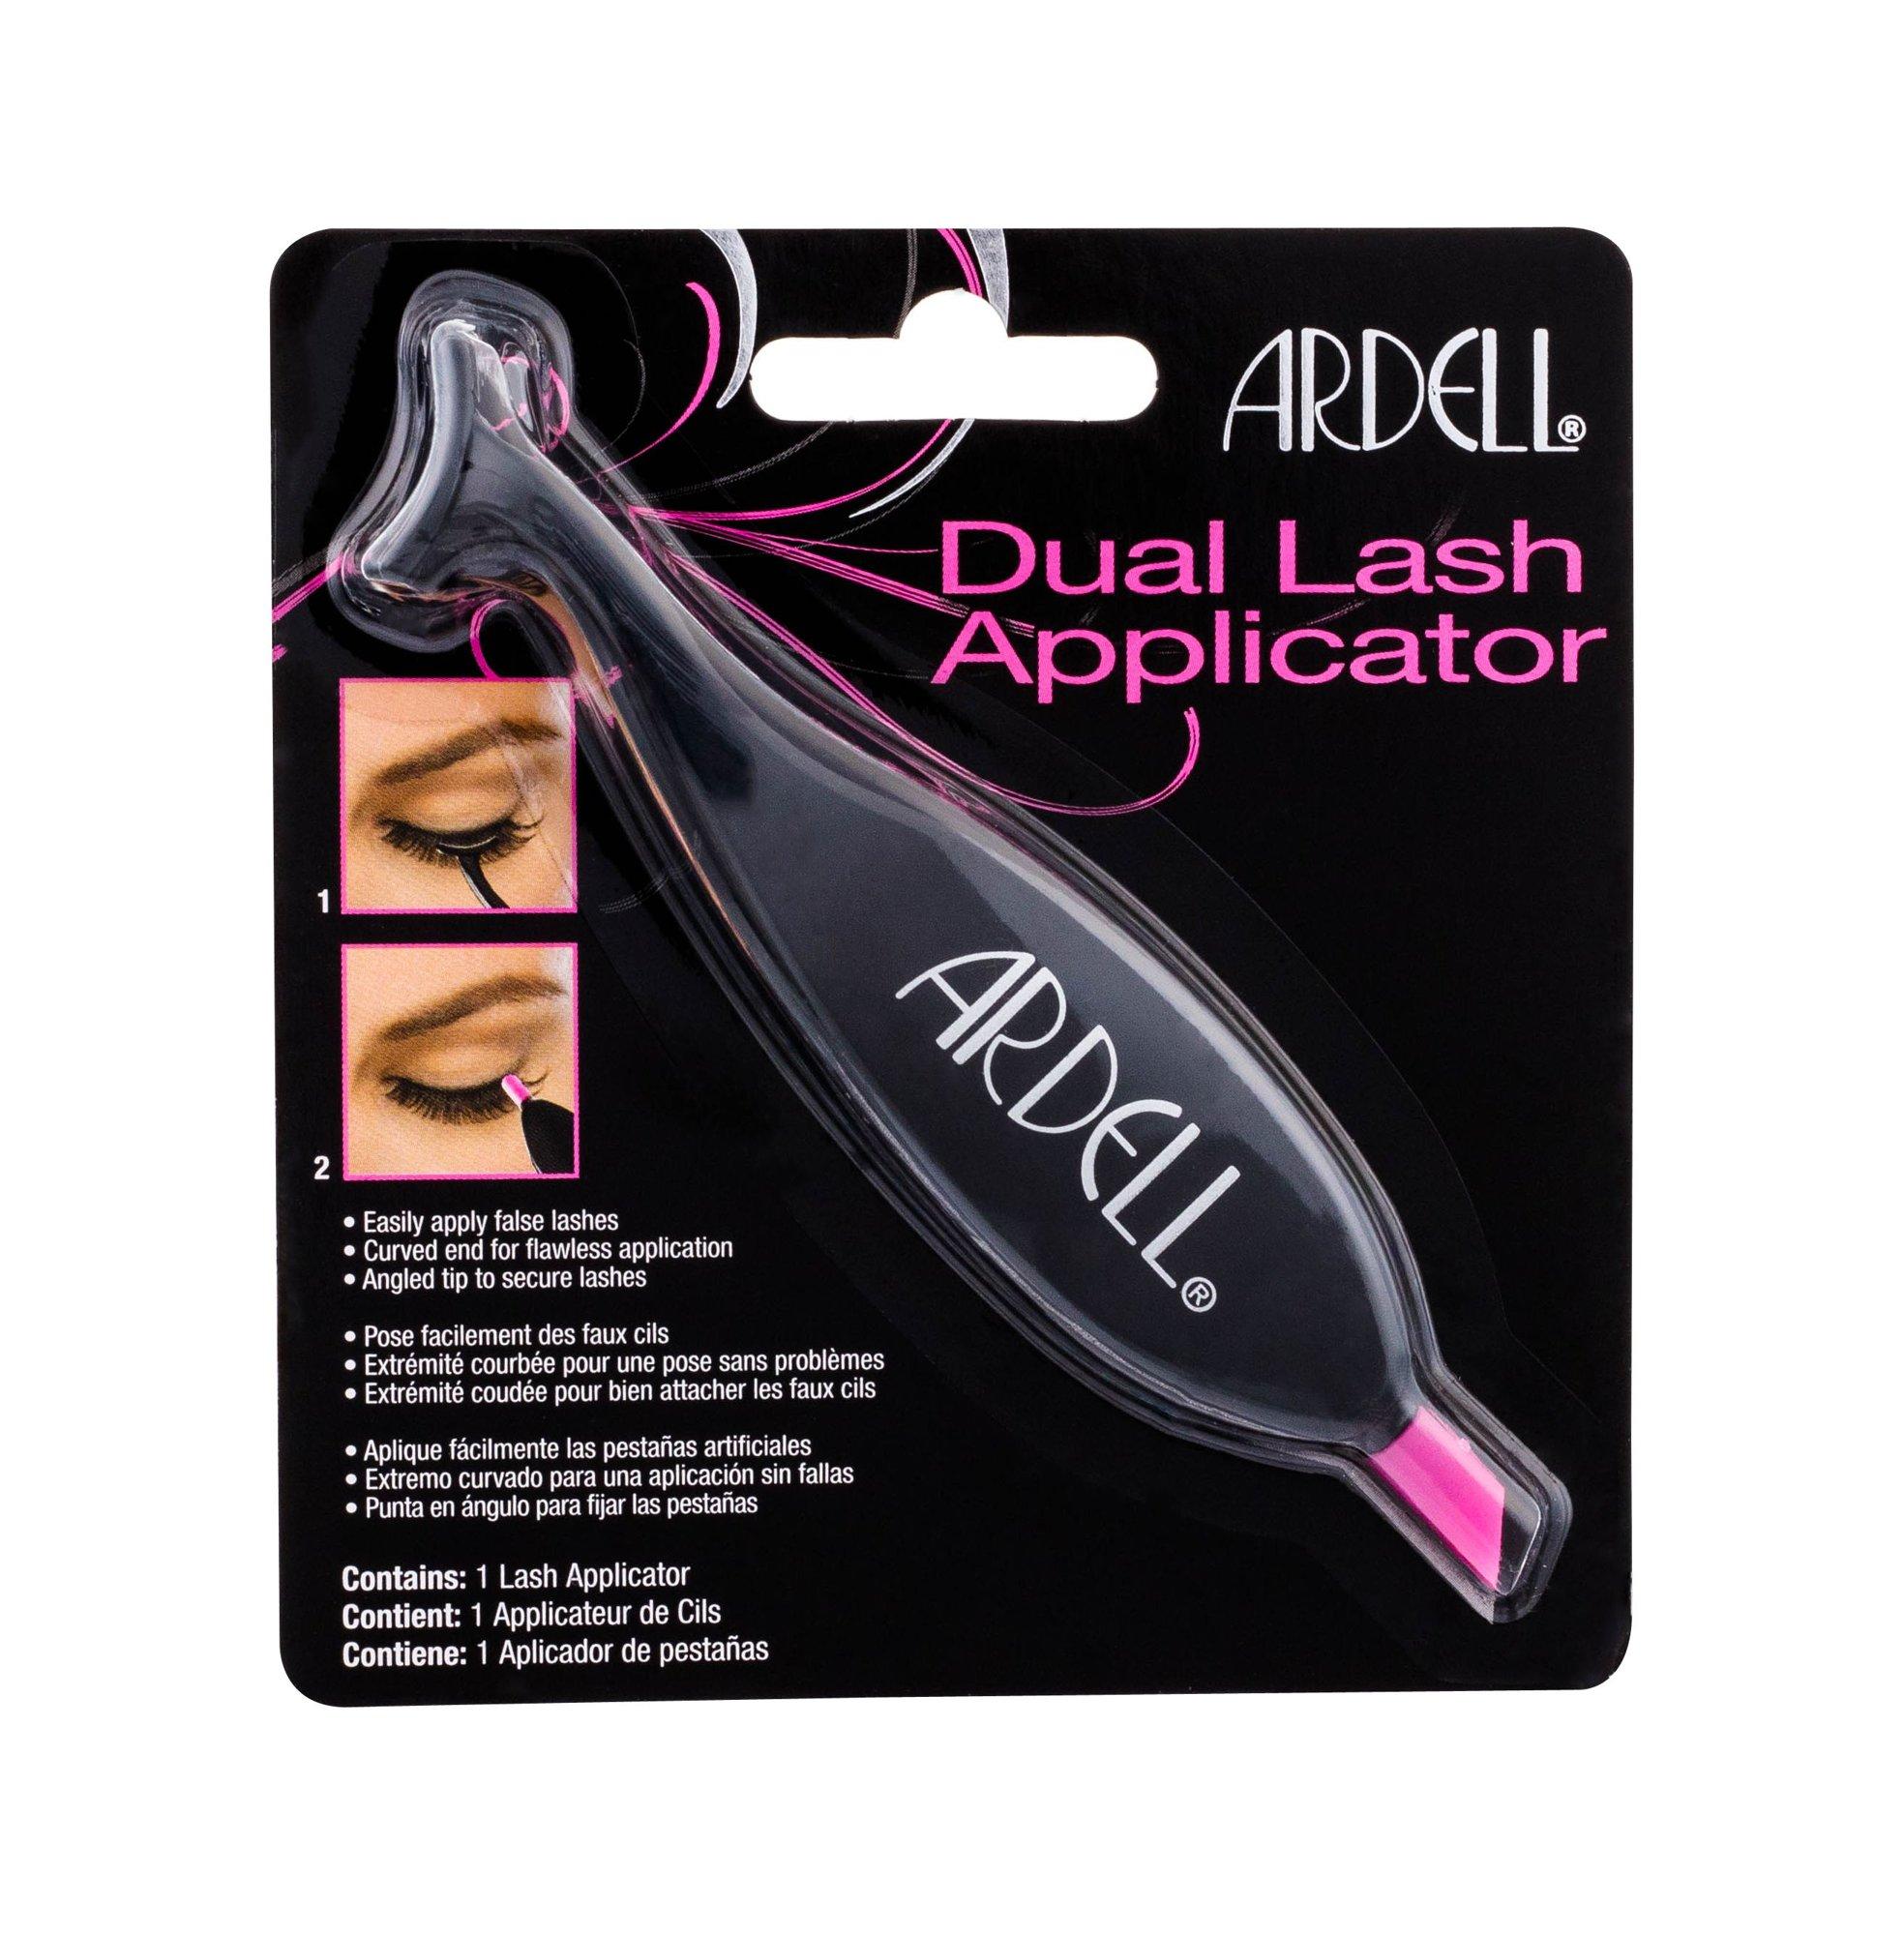 Ardell Dual Lash Applicator False Eyelashes 1ml